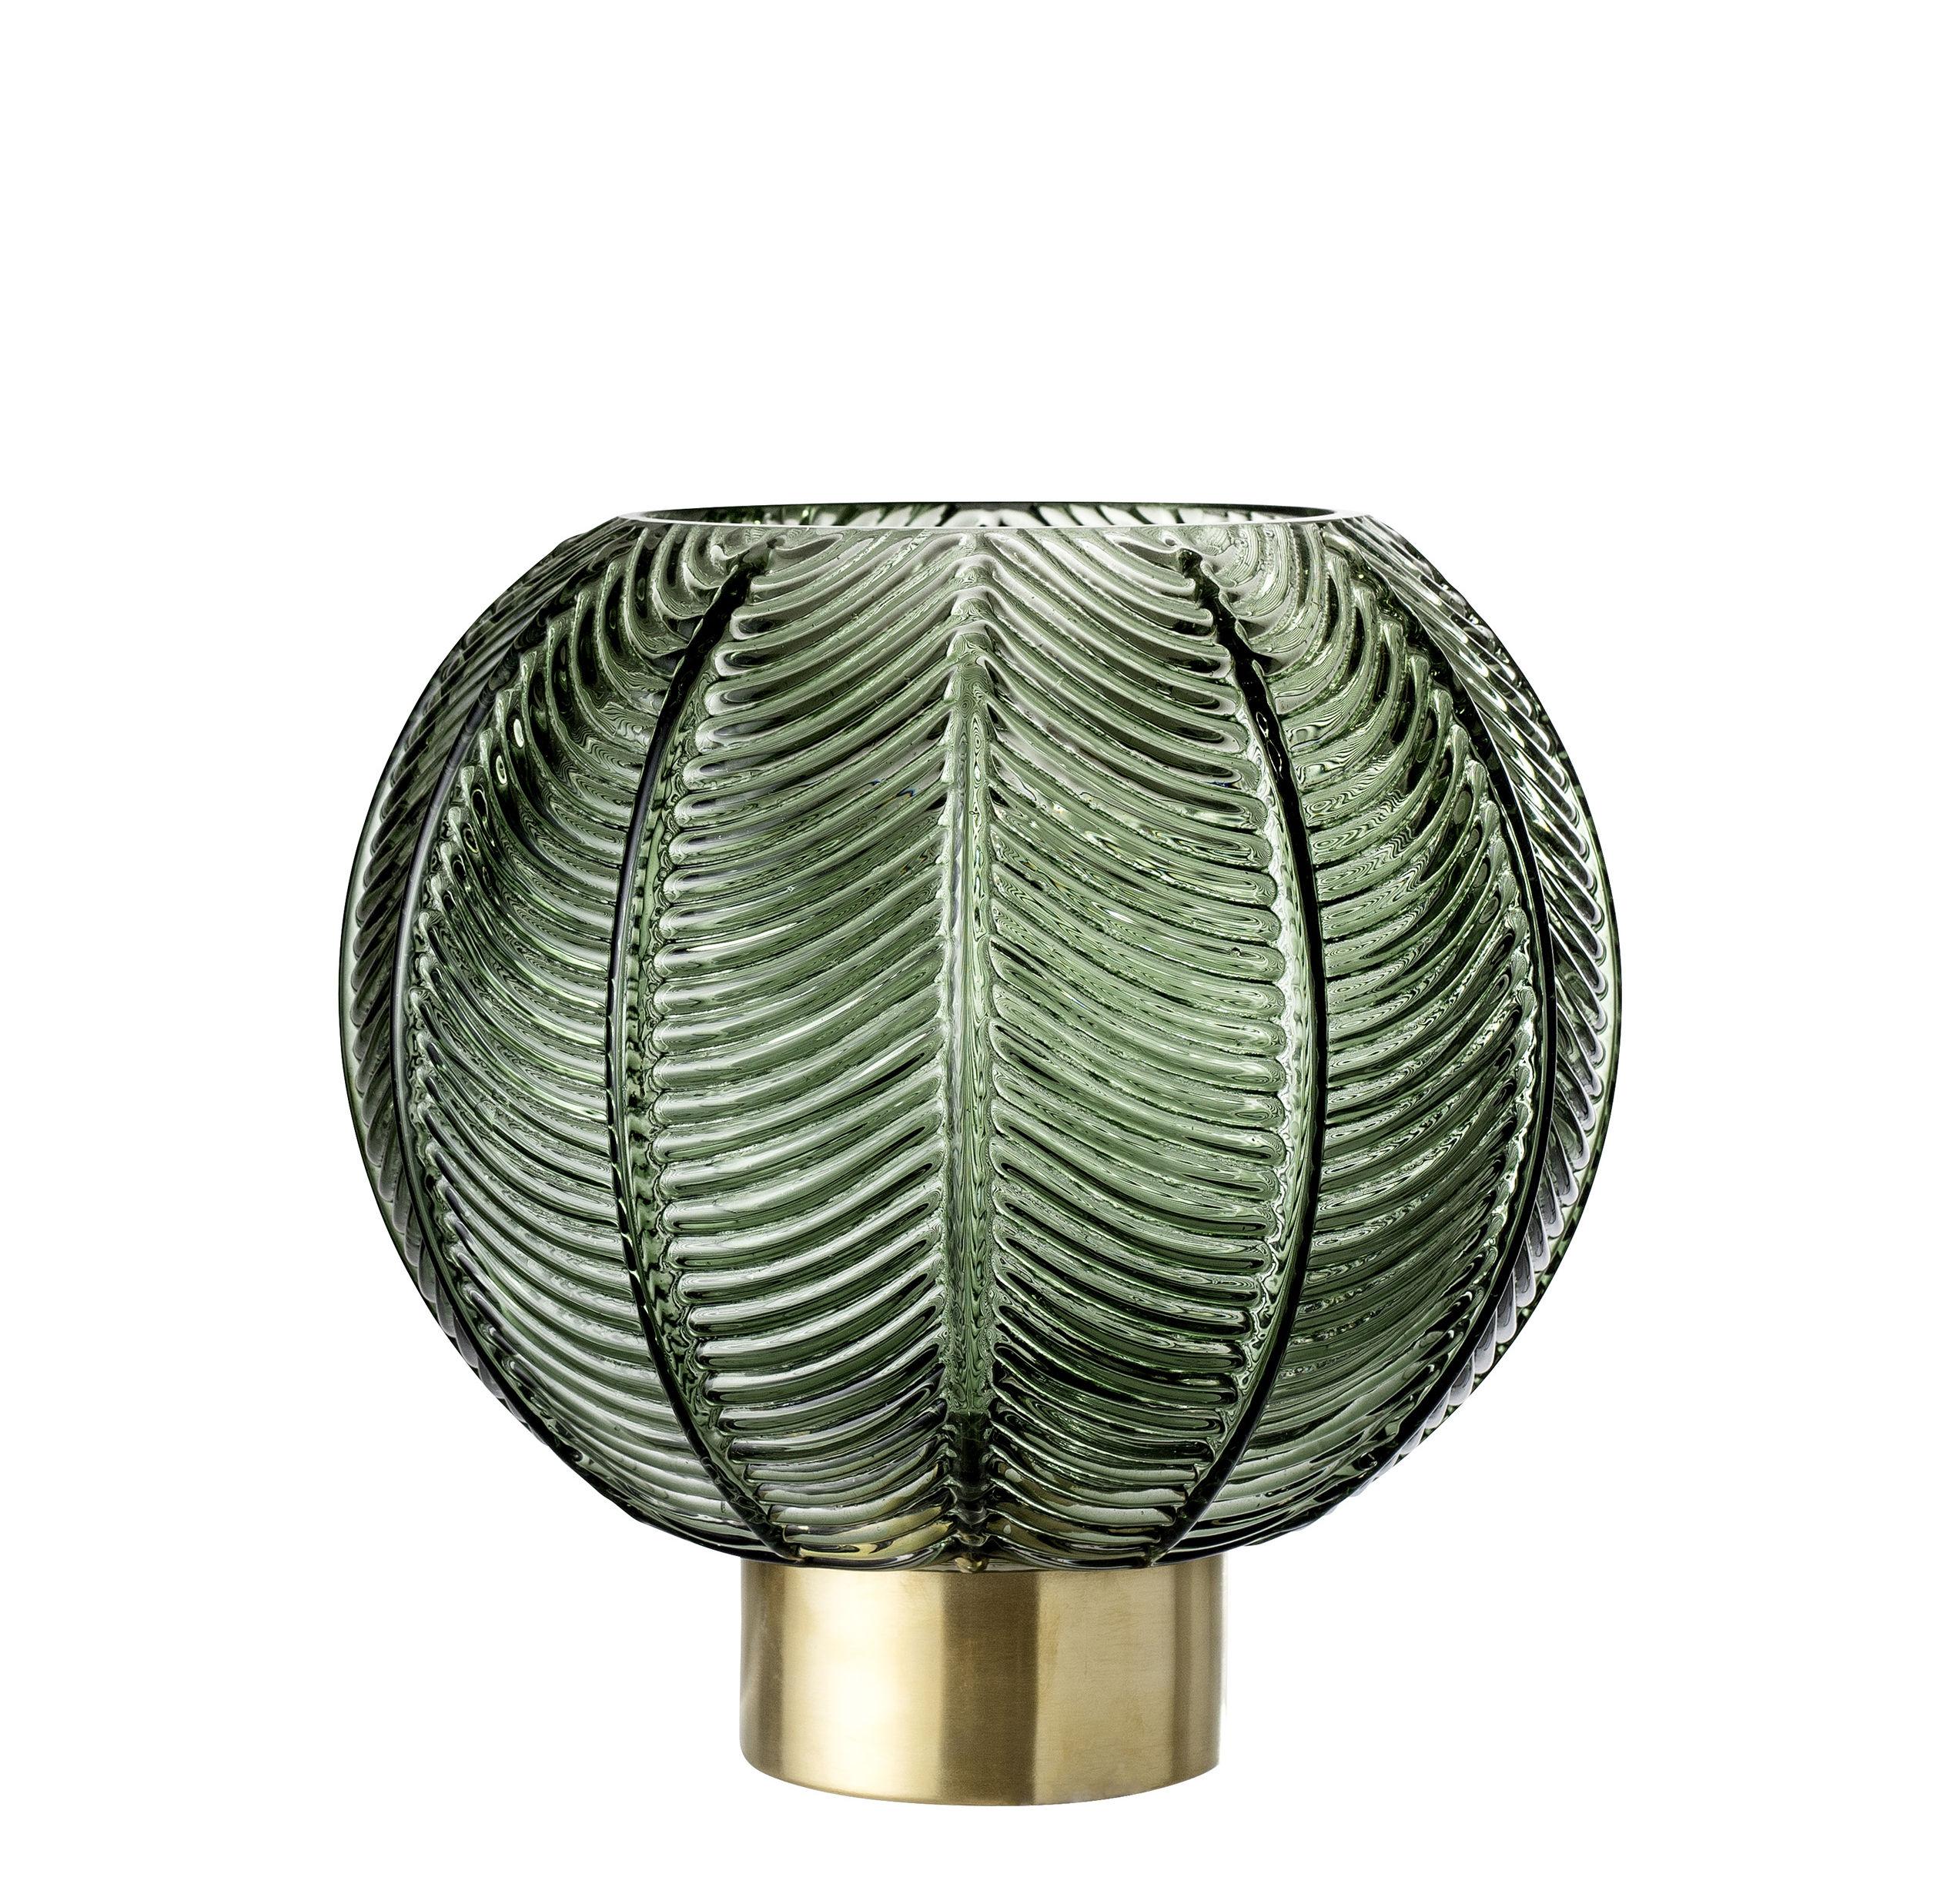 Interni - Vasi - Vaso - / vetro & Metallo - Ø 20 x H 21 di Bloomingville - Verde & oro - Metallo, Verre texturé